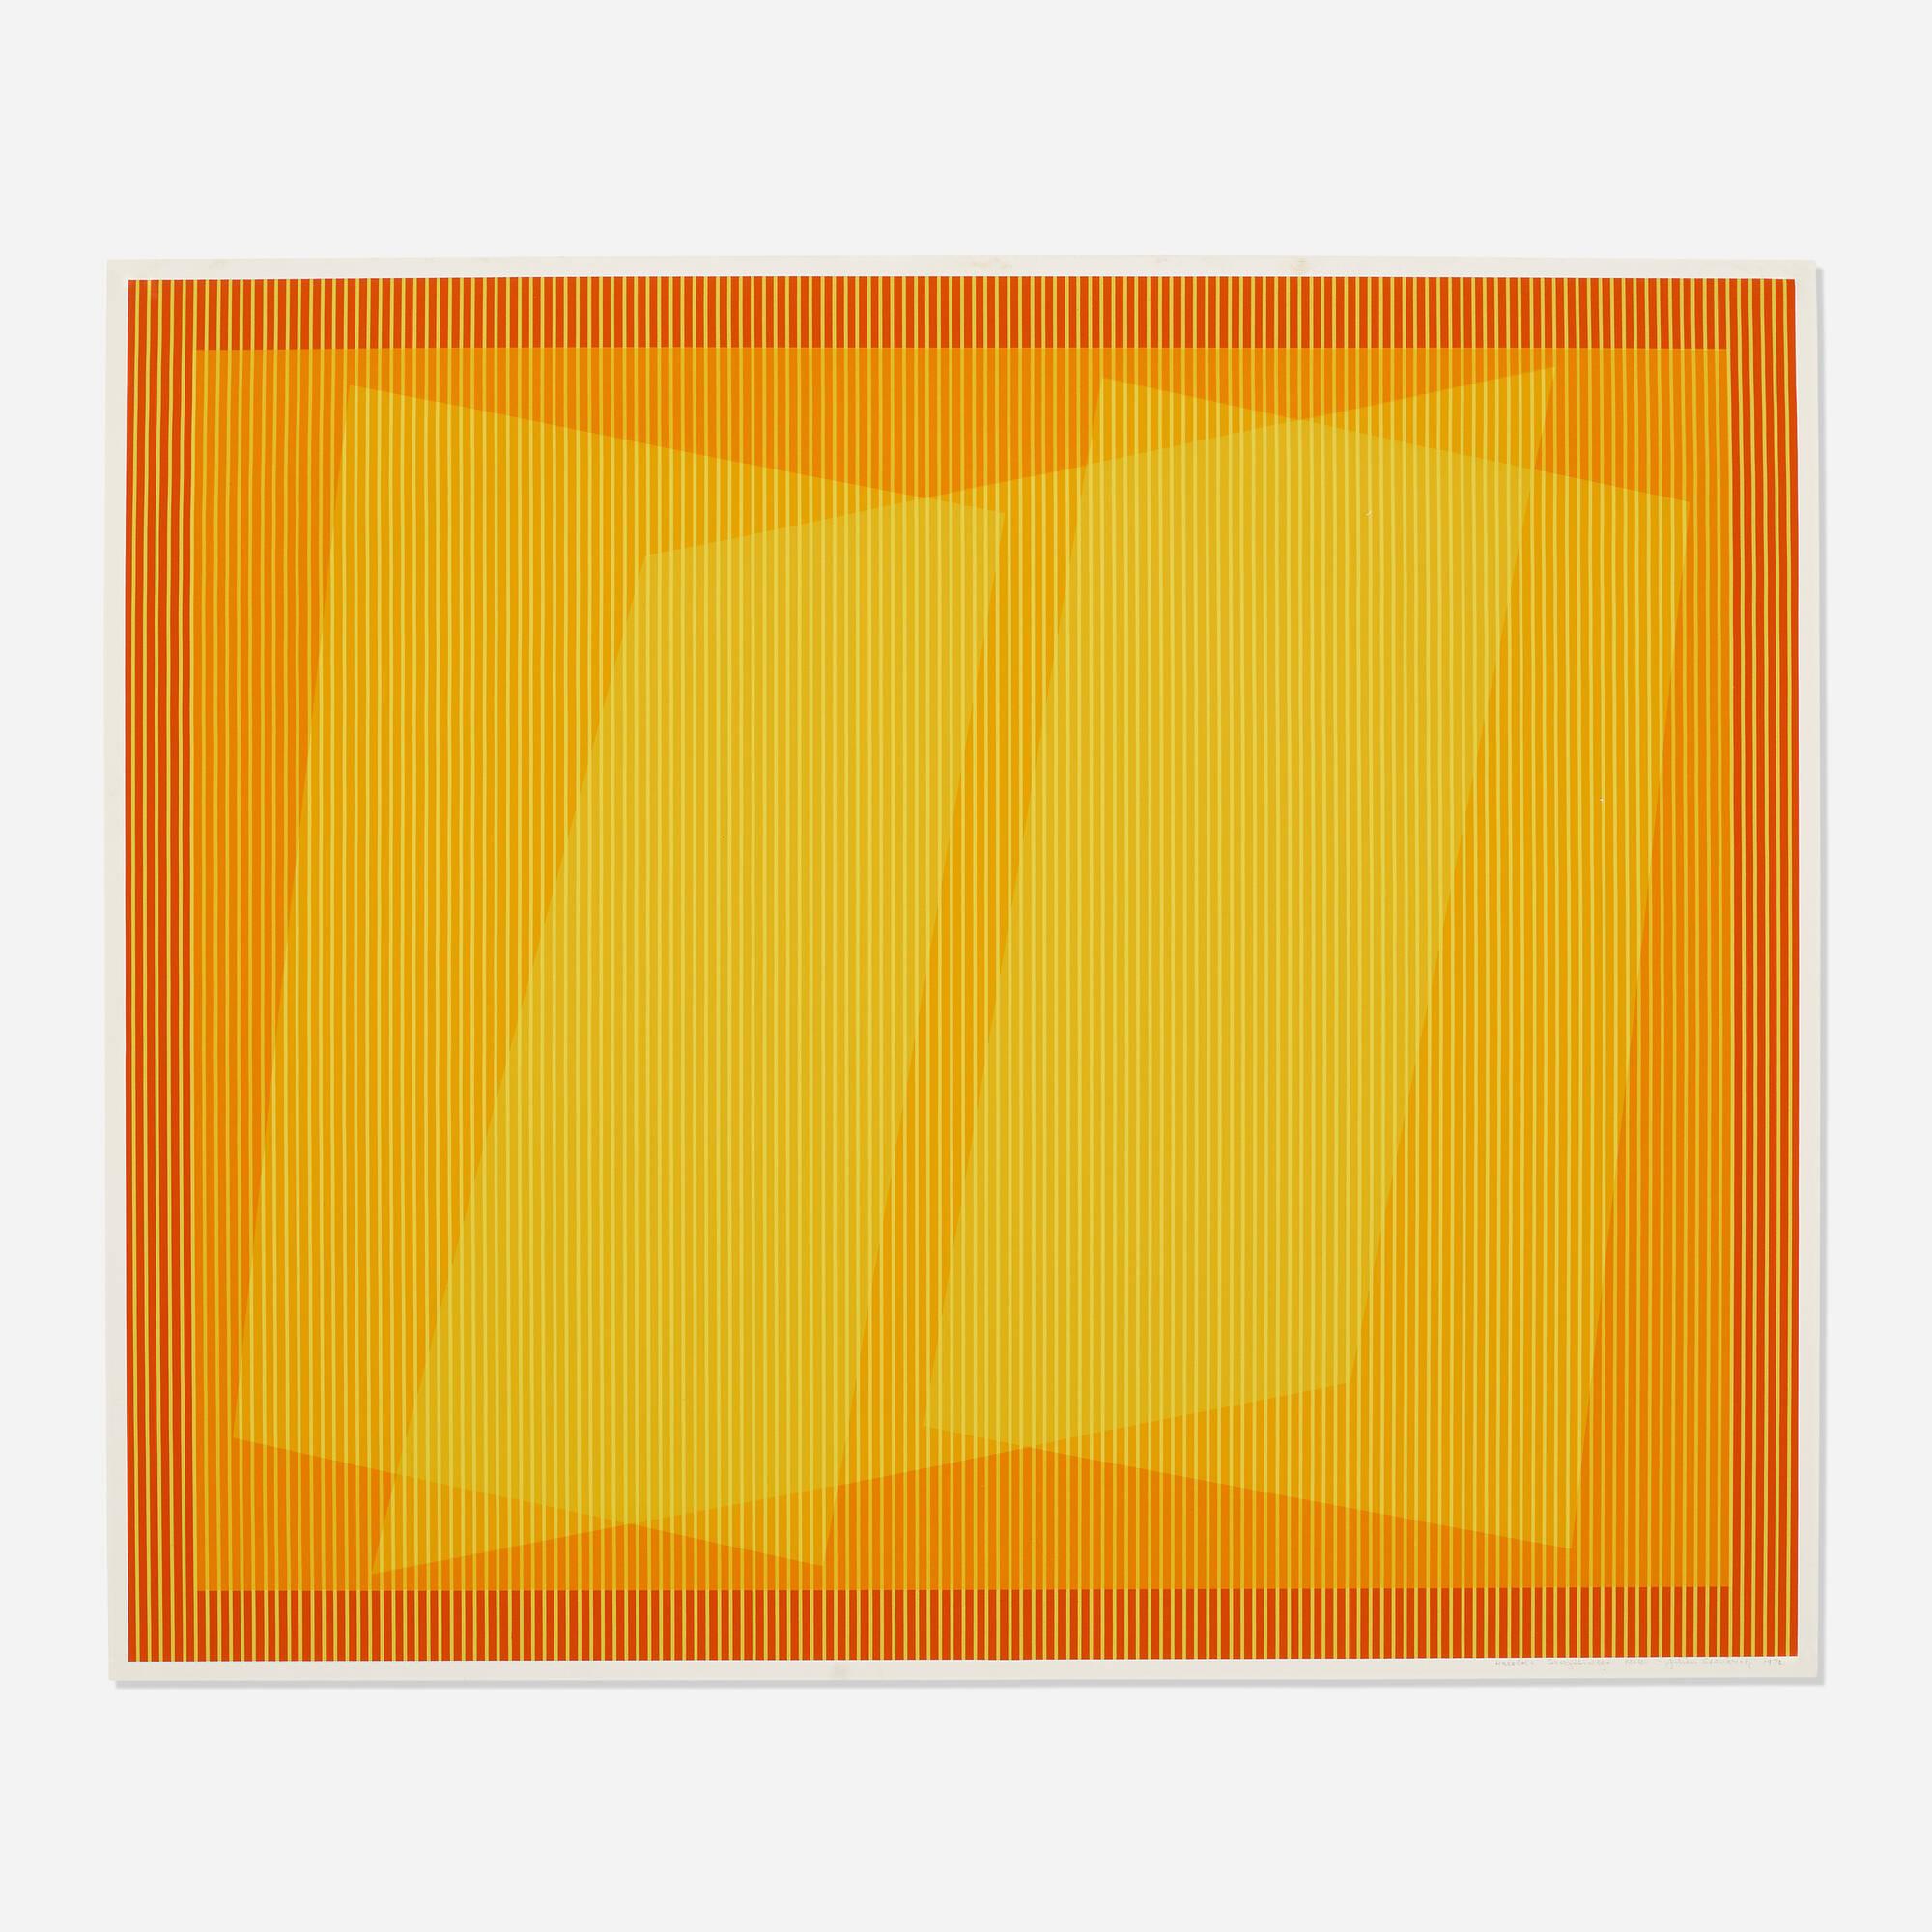 122: Julian Stanczak / Dimensional (1 of 1)